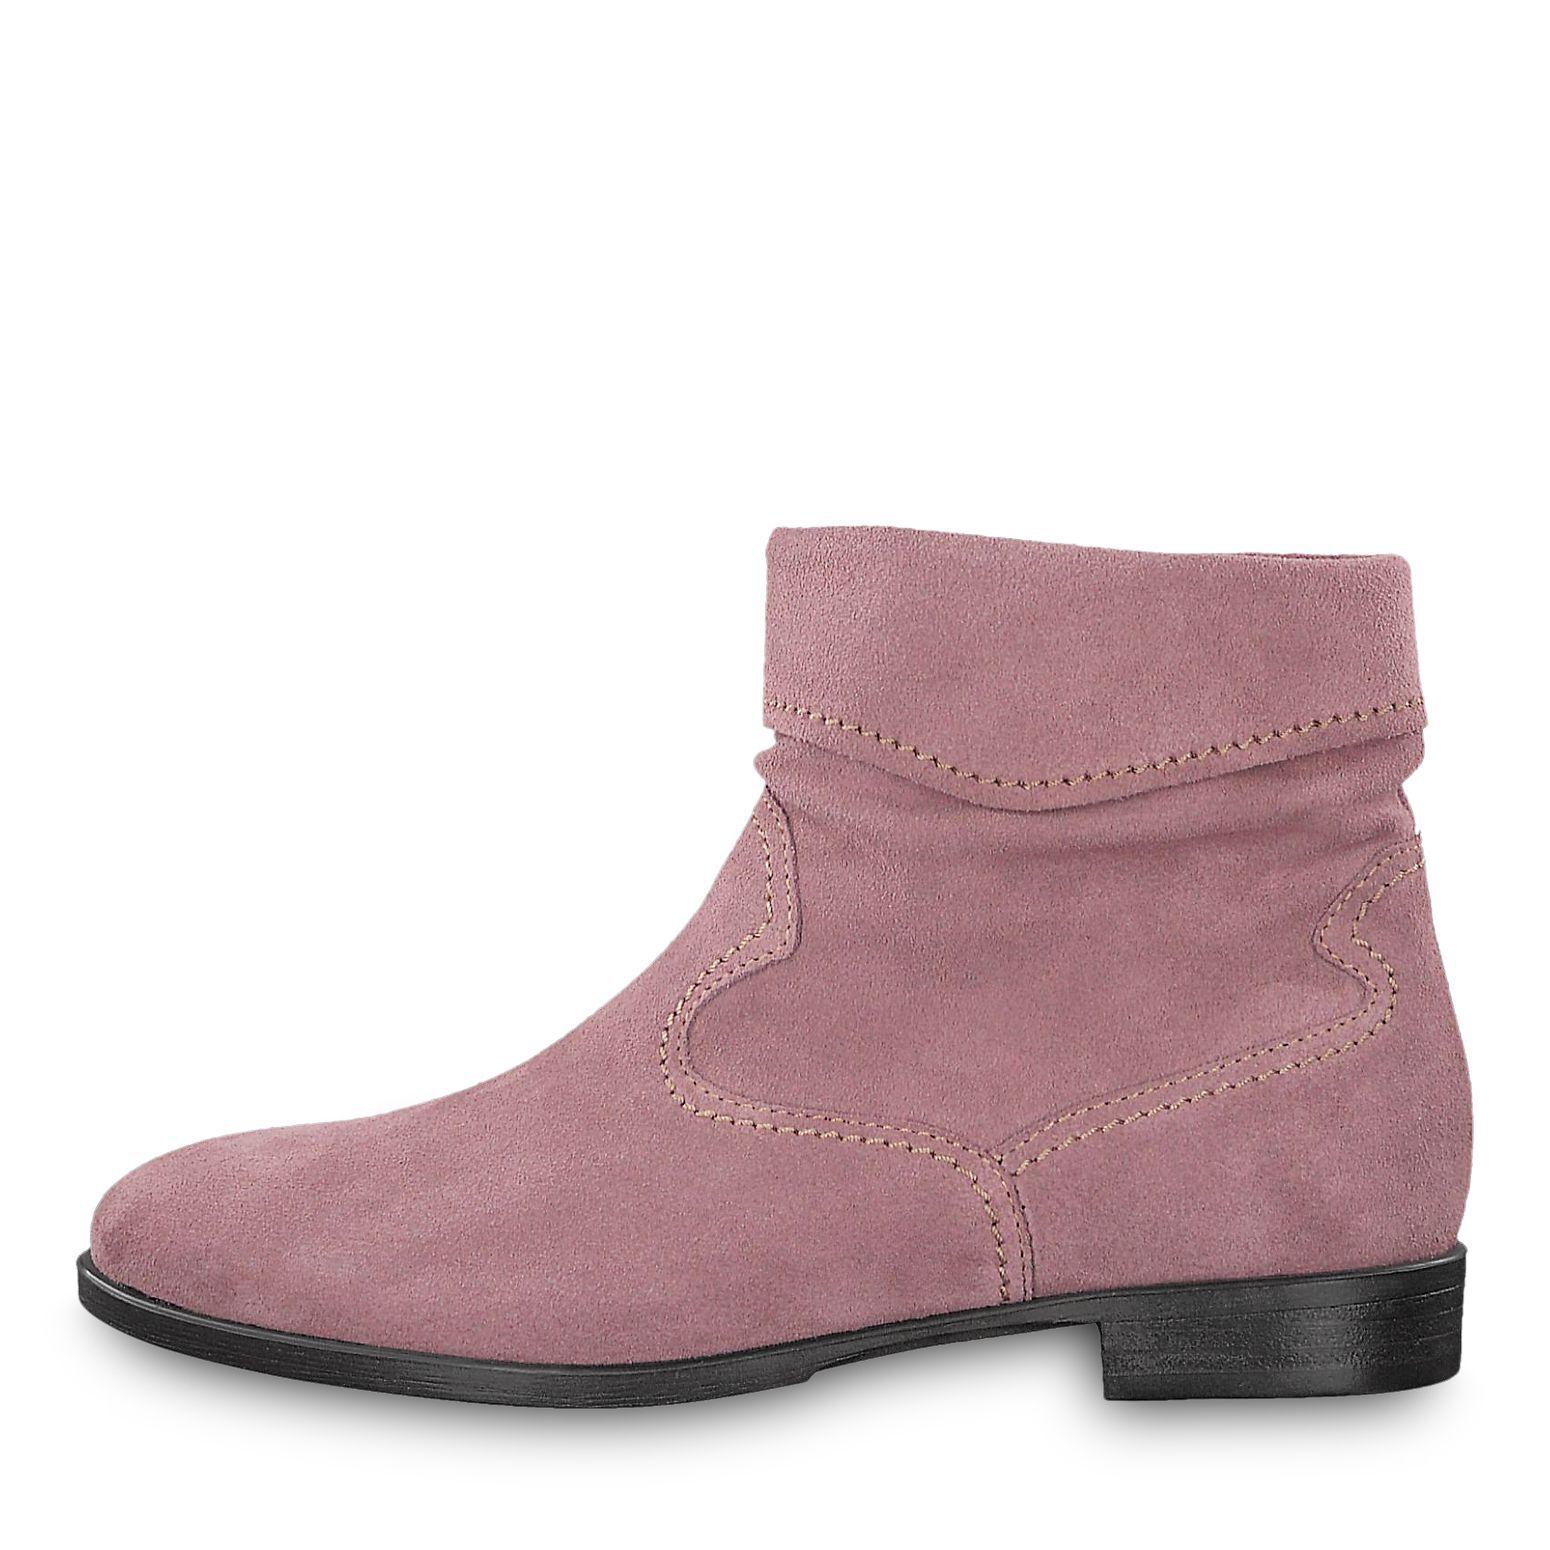 Court Bottes Talons bruts Plateforme Chaussures... Aegyt0JMtK